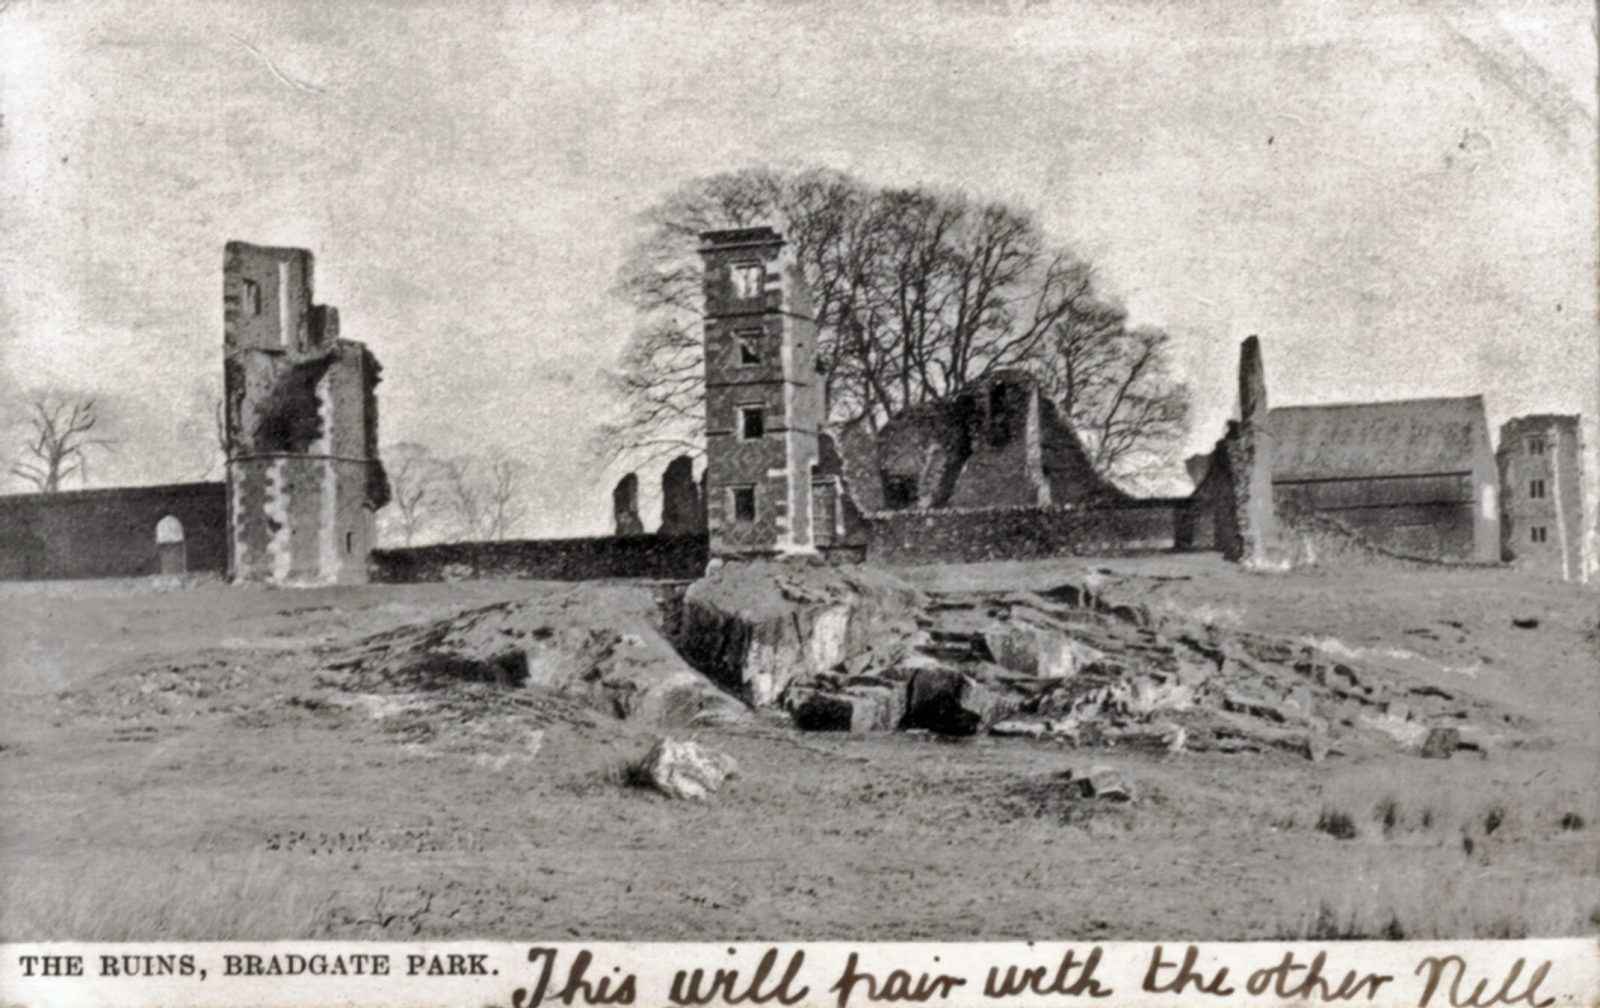 Bradgate Park, Leicester. 1901-1920: Ruins of Bradgate House. Franked 1904 (File:1127)